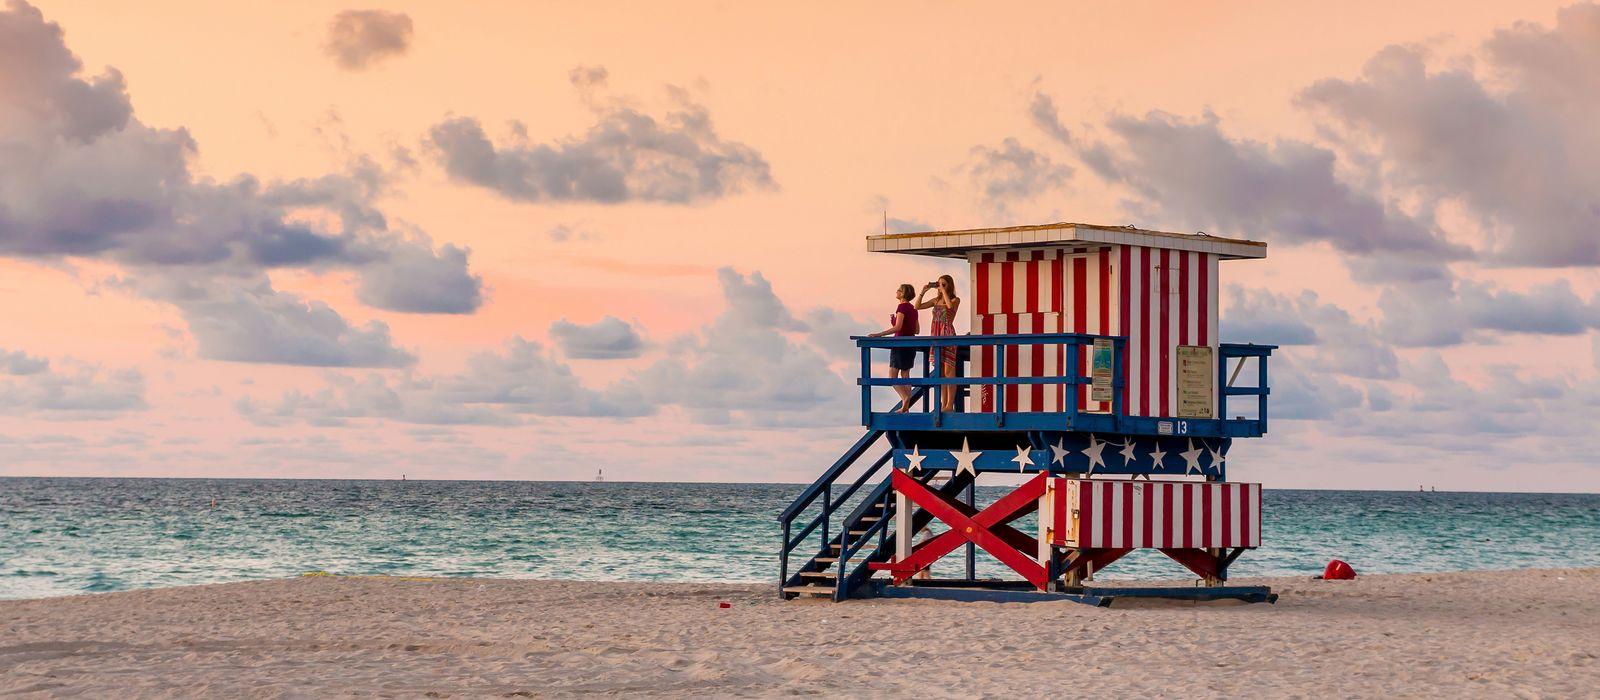 Colorful Lifeguard Tower in South Beach, Miami Beach, Florida